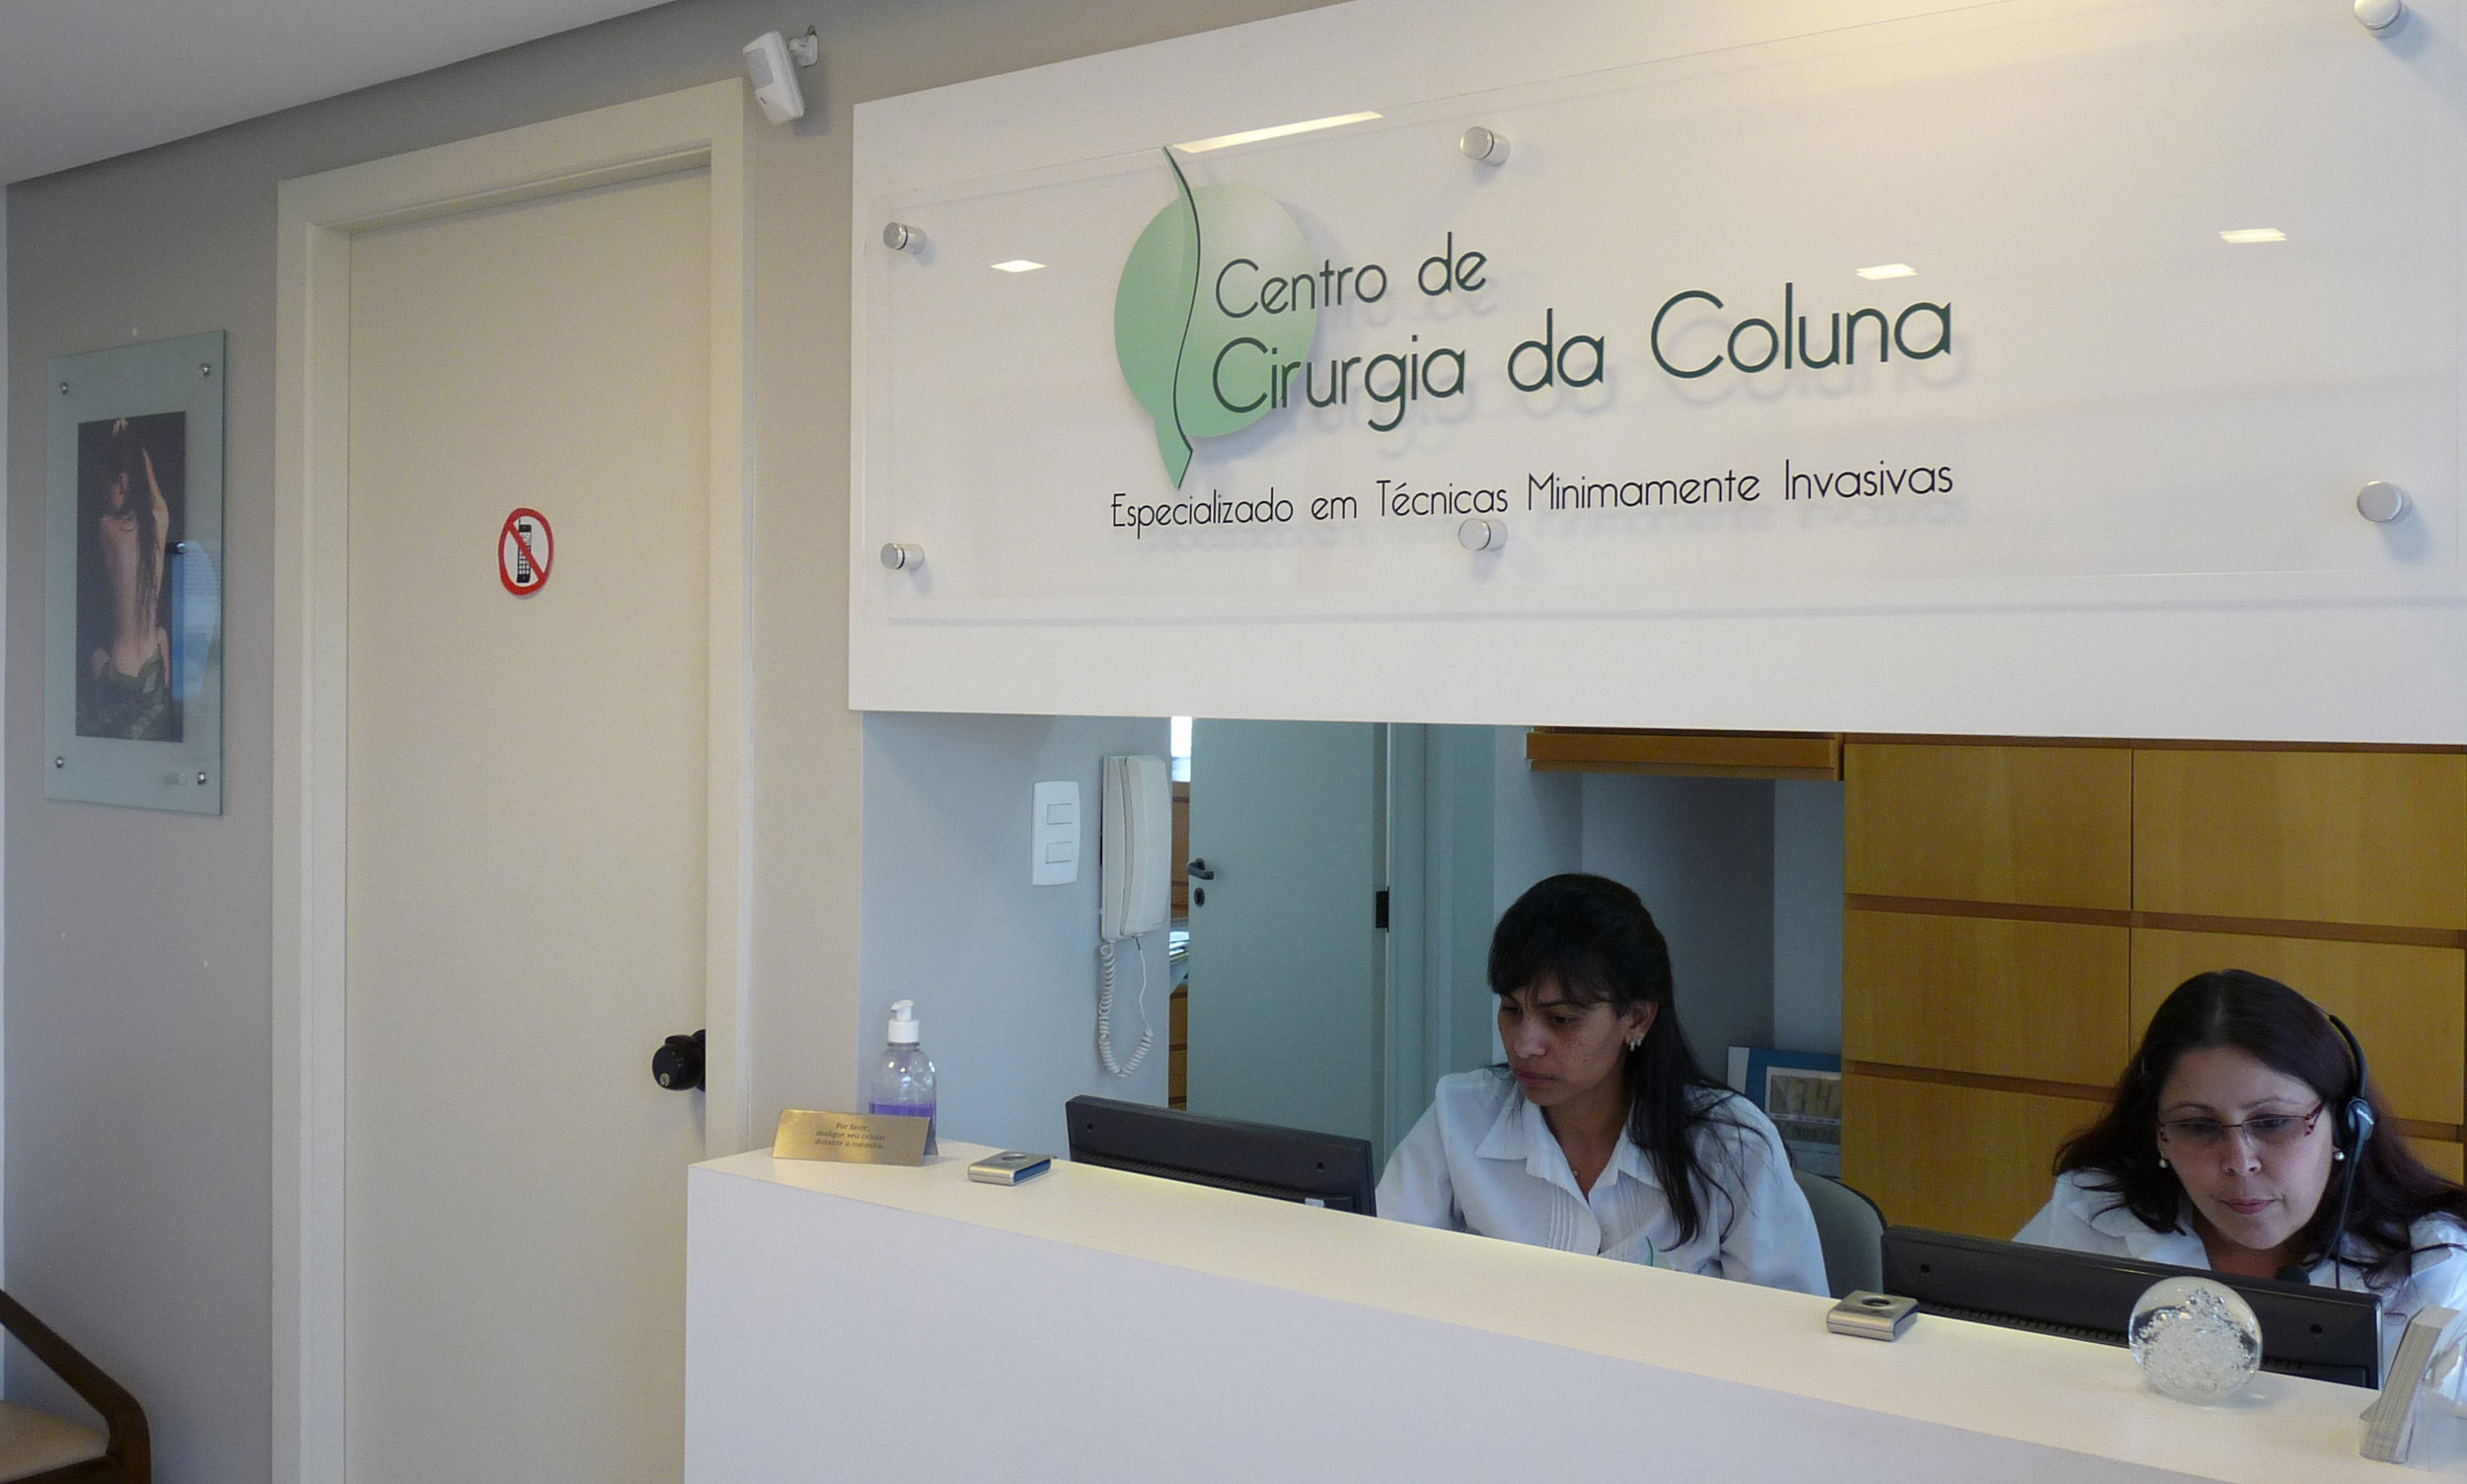 CentrodeCirurgiadaColuna2.jpg